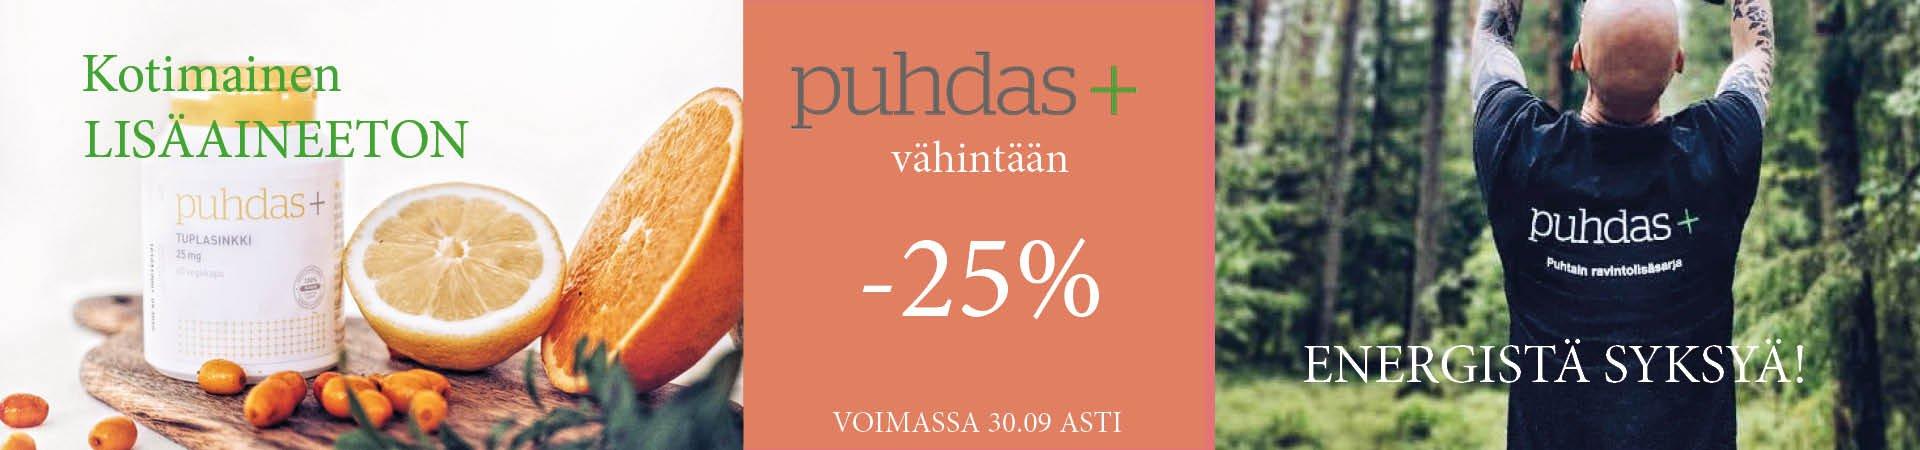 Puhdas+ -25%